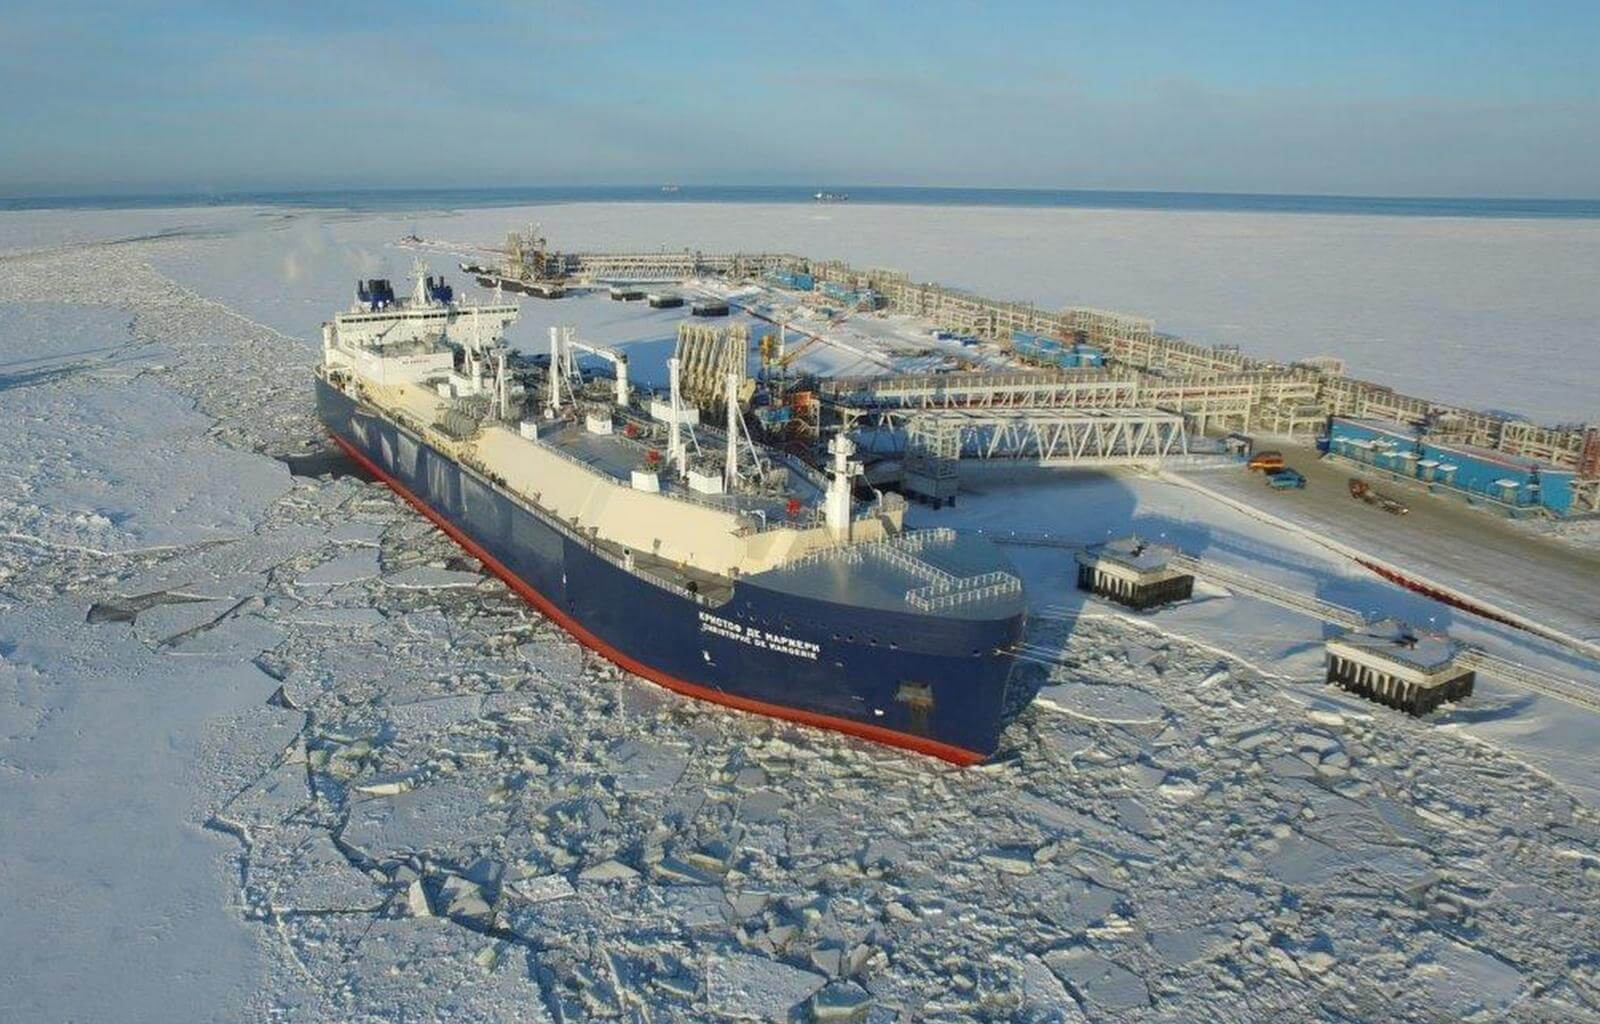 کشتی یخ شکن حمل ال ان جی در تاسیسات یامال شرکت نواک روسیه